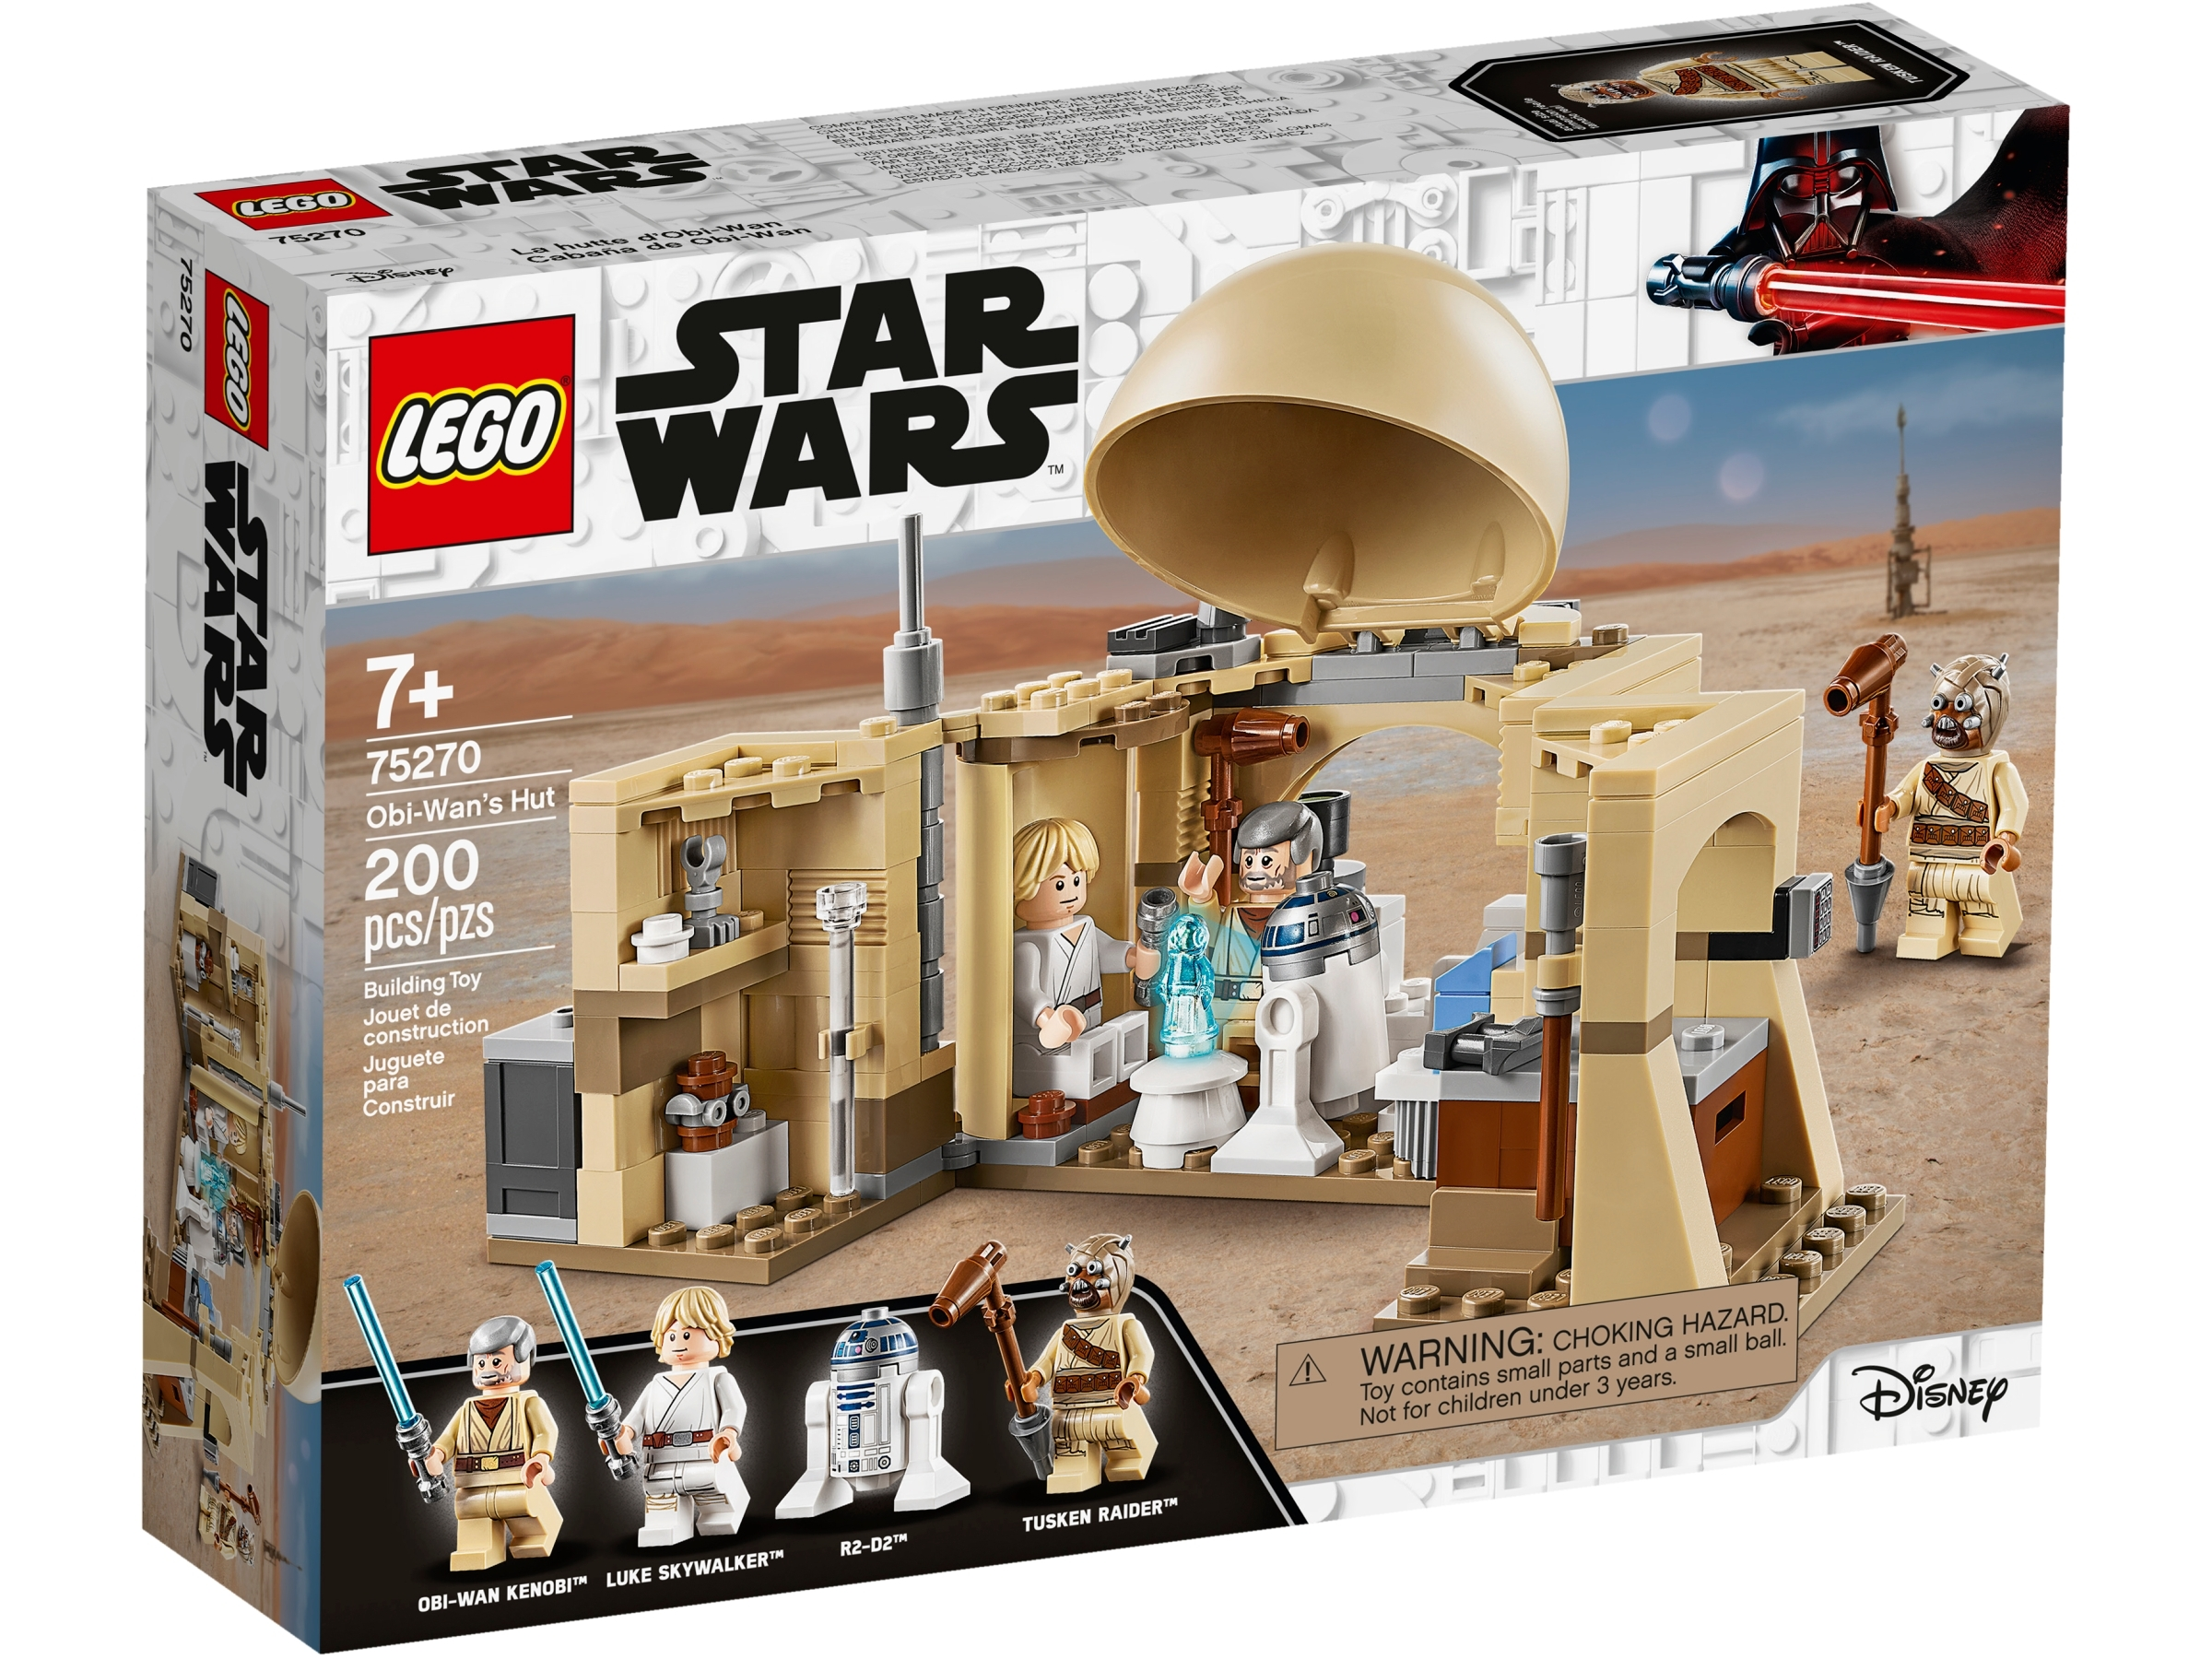 Lego Tan Beige 200 Piece Lot Buy 2 Get 1 FREE